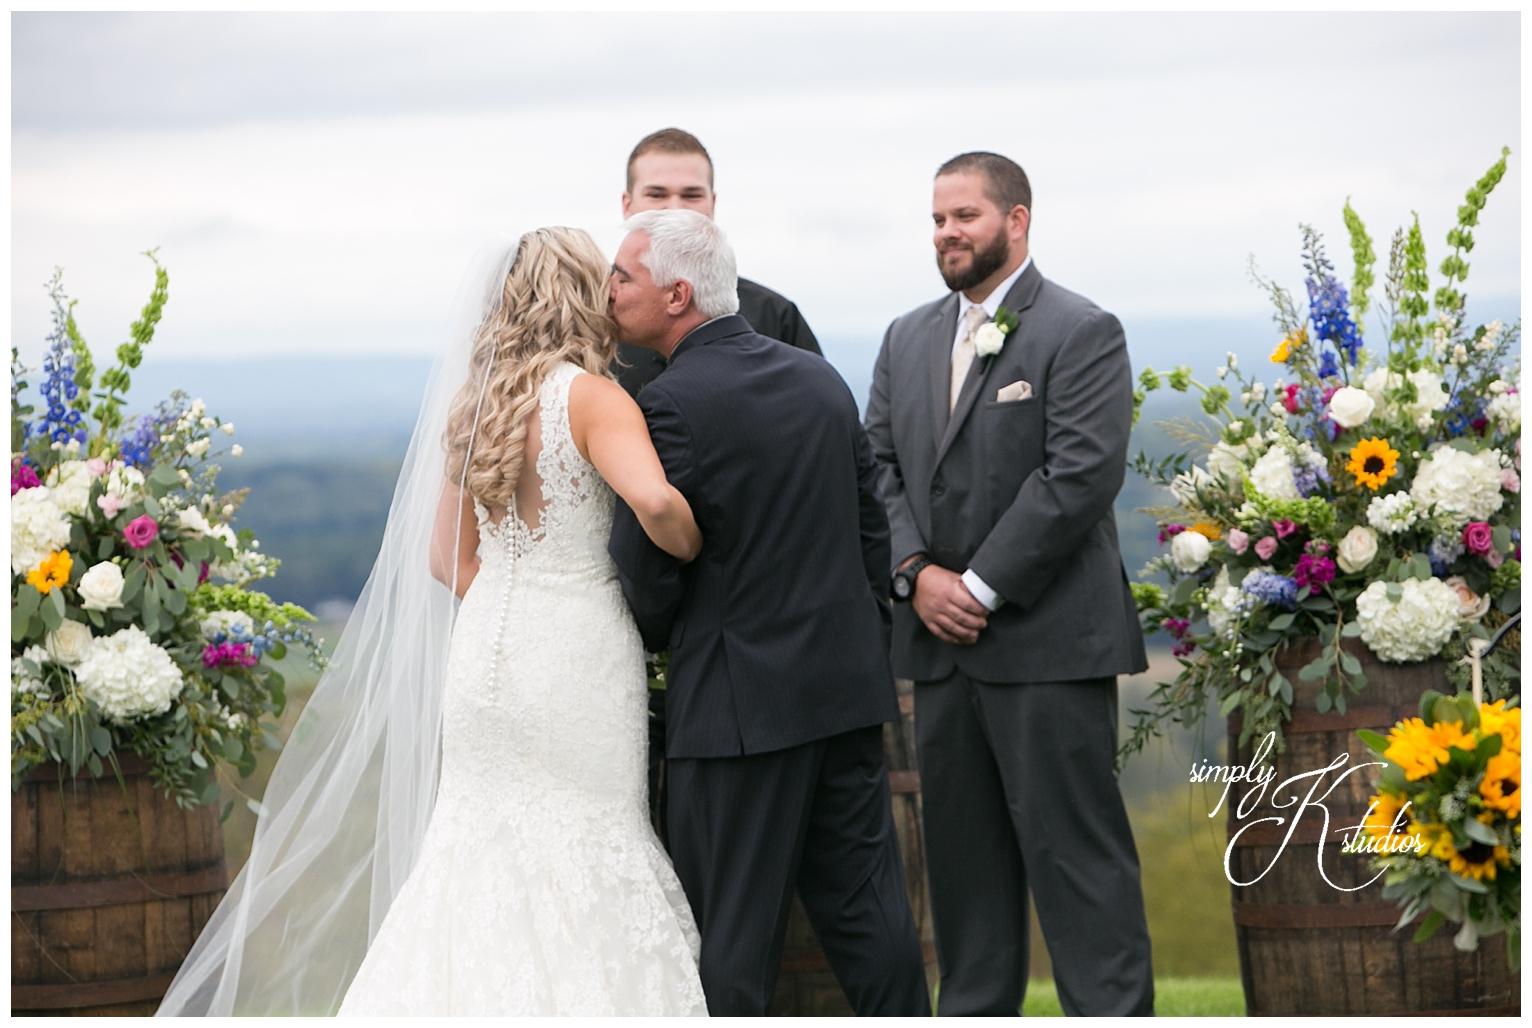 Wedding Photographer in Ellington CT.jpg